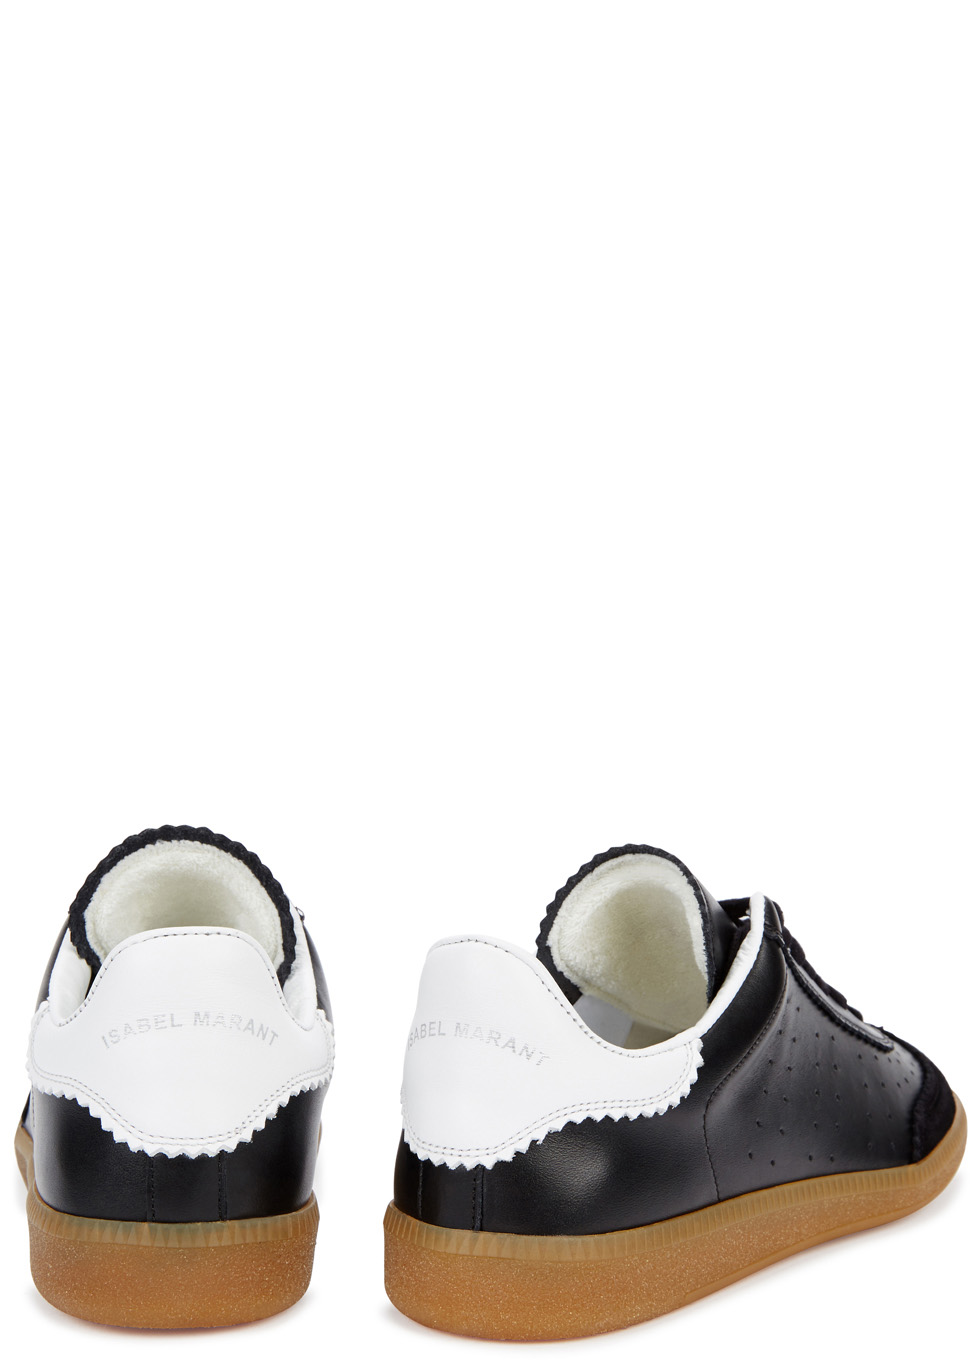 Isabel Marant Bryce black leather